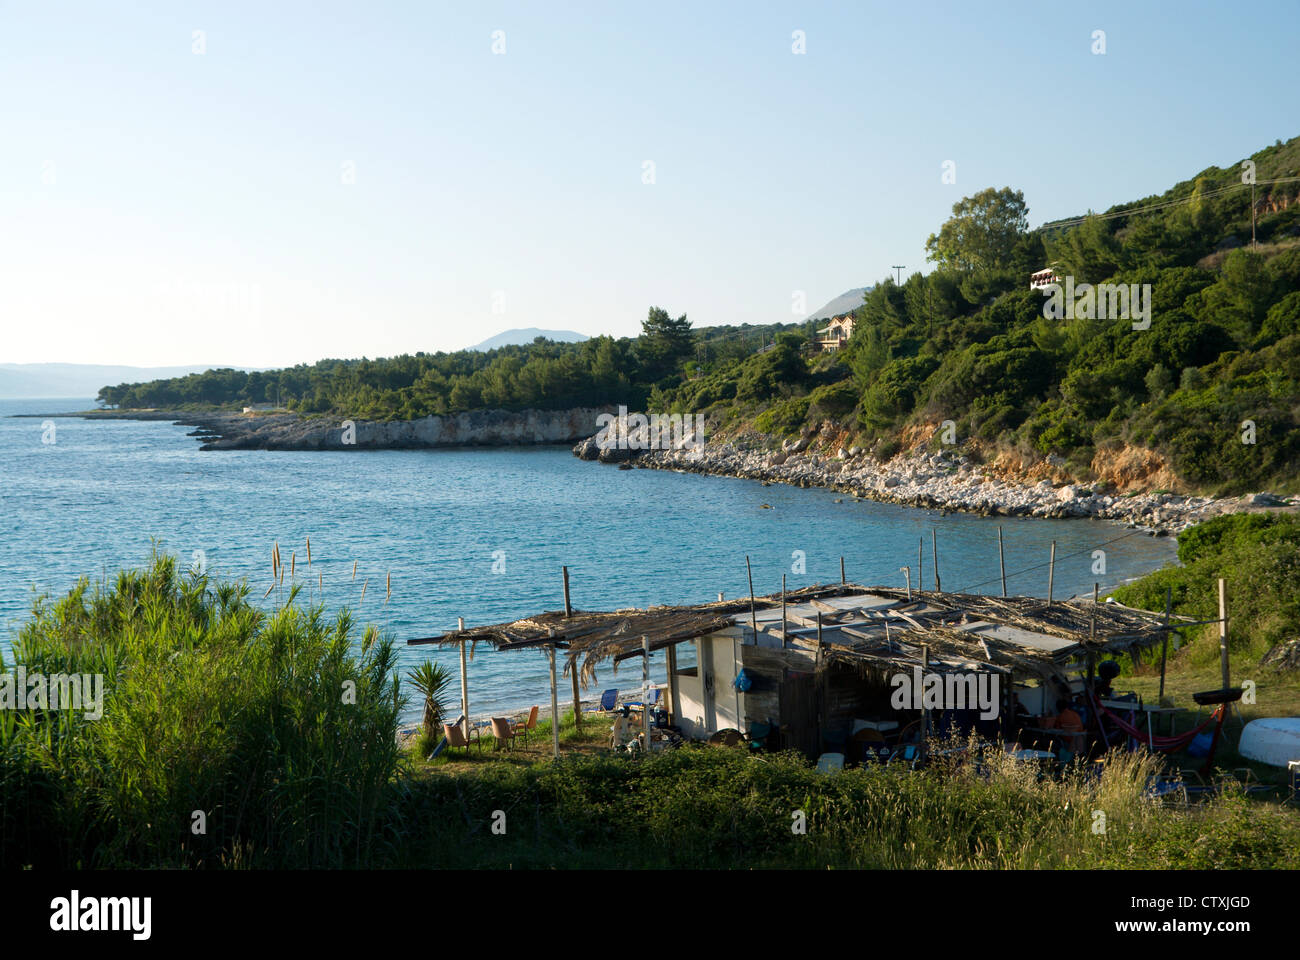 Shack/snack bar, Kalamia beach, Lassi, Argostoli, Kefalonia, Ionian Islands, Greece. - Stock Image